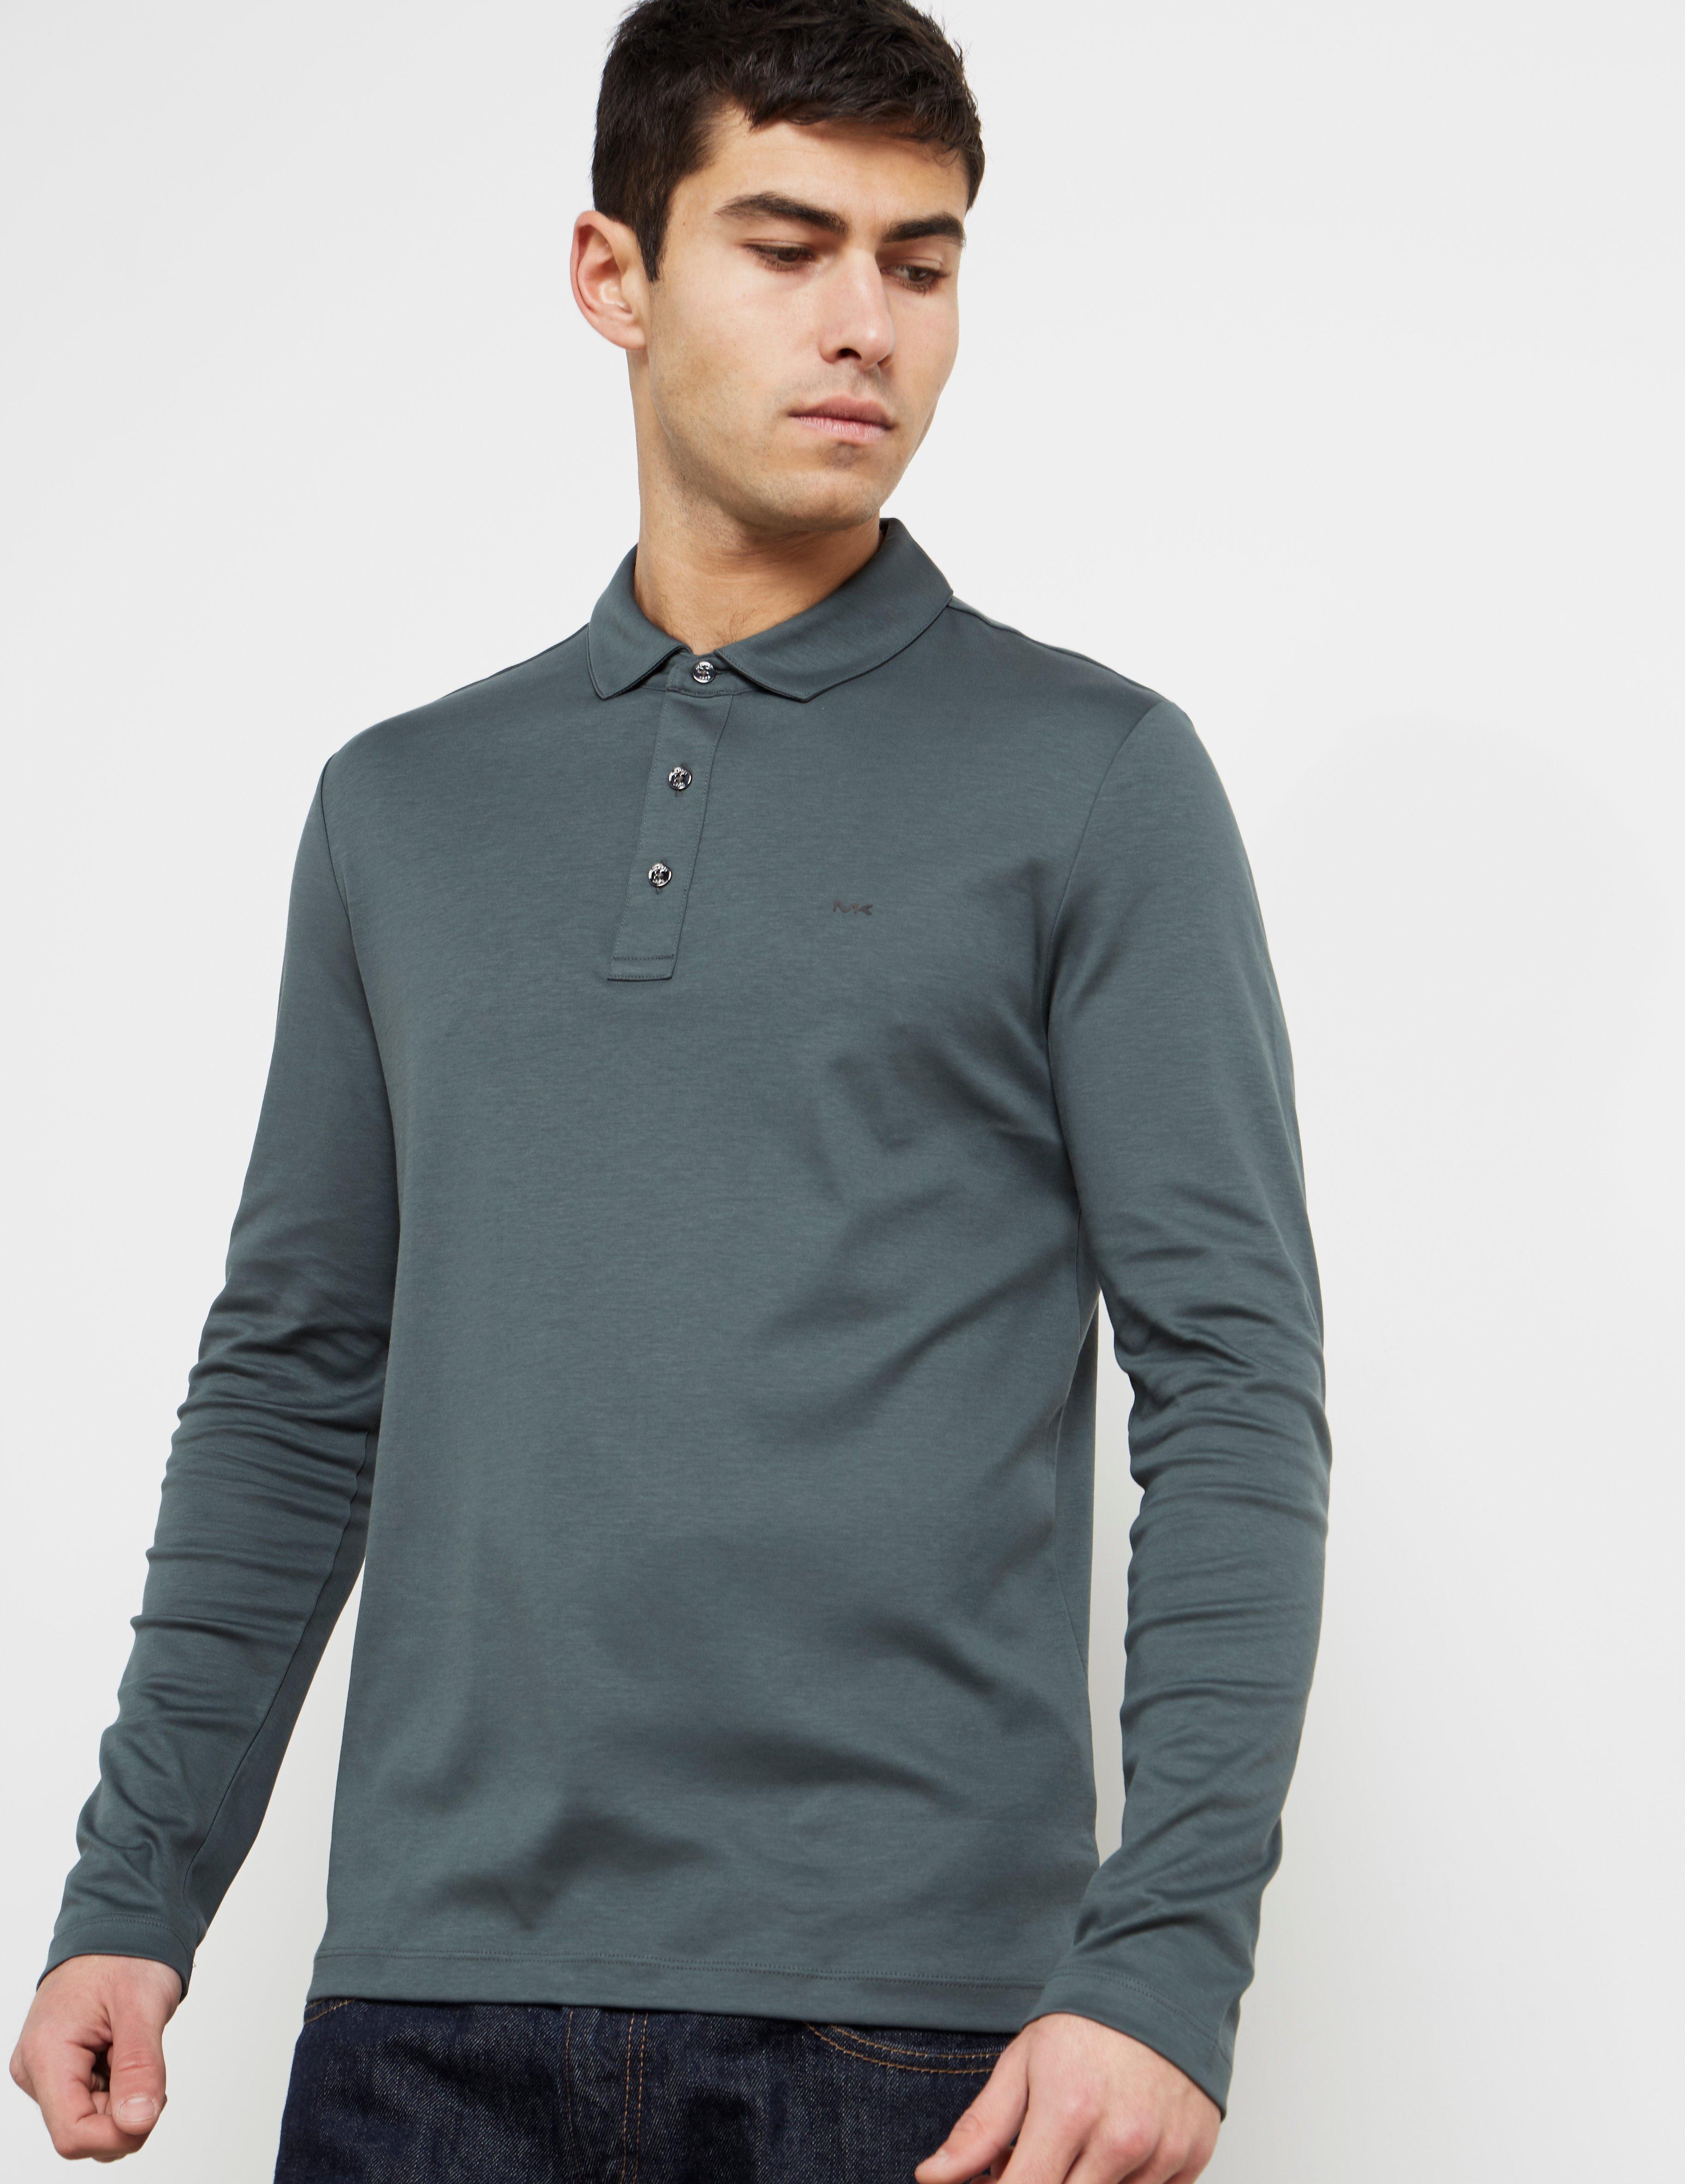 9eddc07c Lyst - Michael Kors Mens Sleek Long Sleeve Polo Shirt Green in Green ...